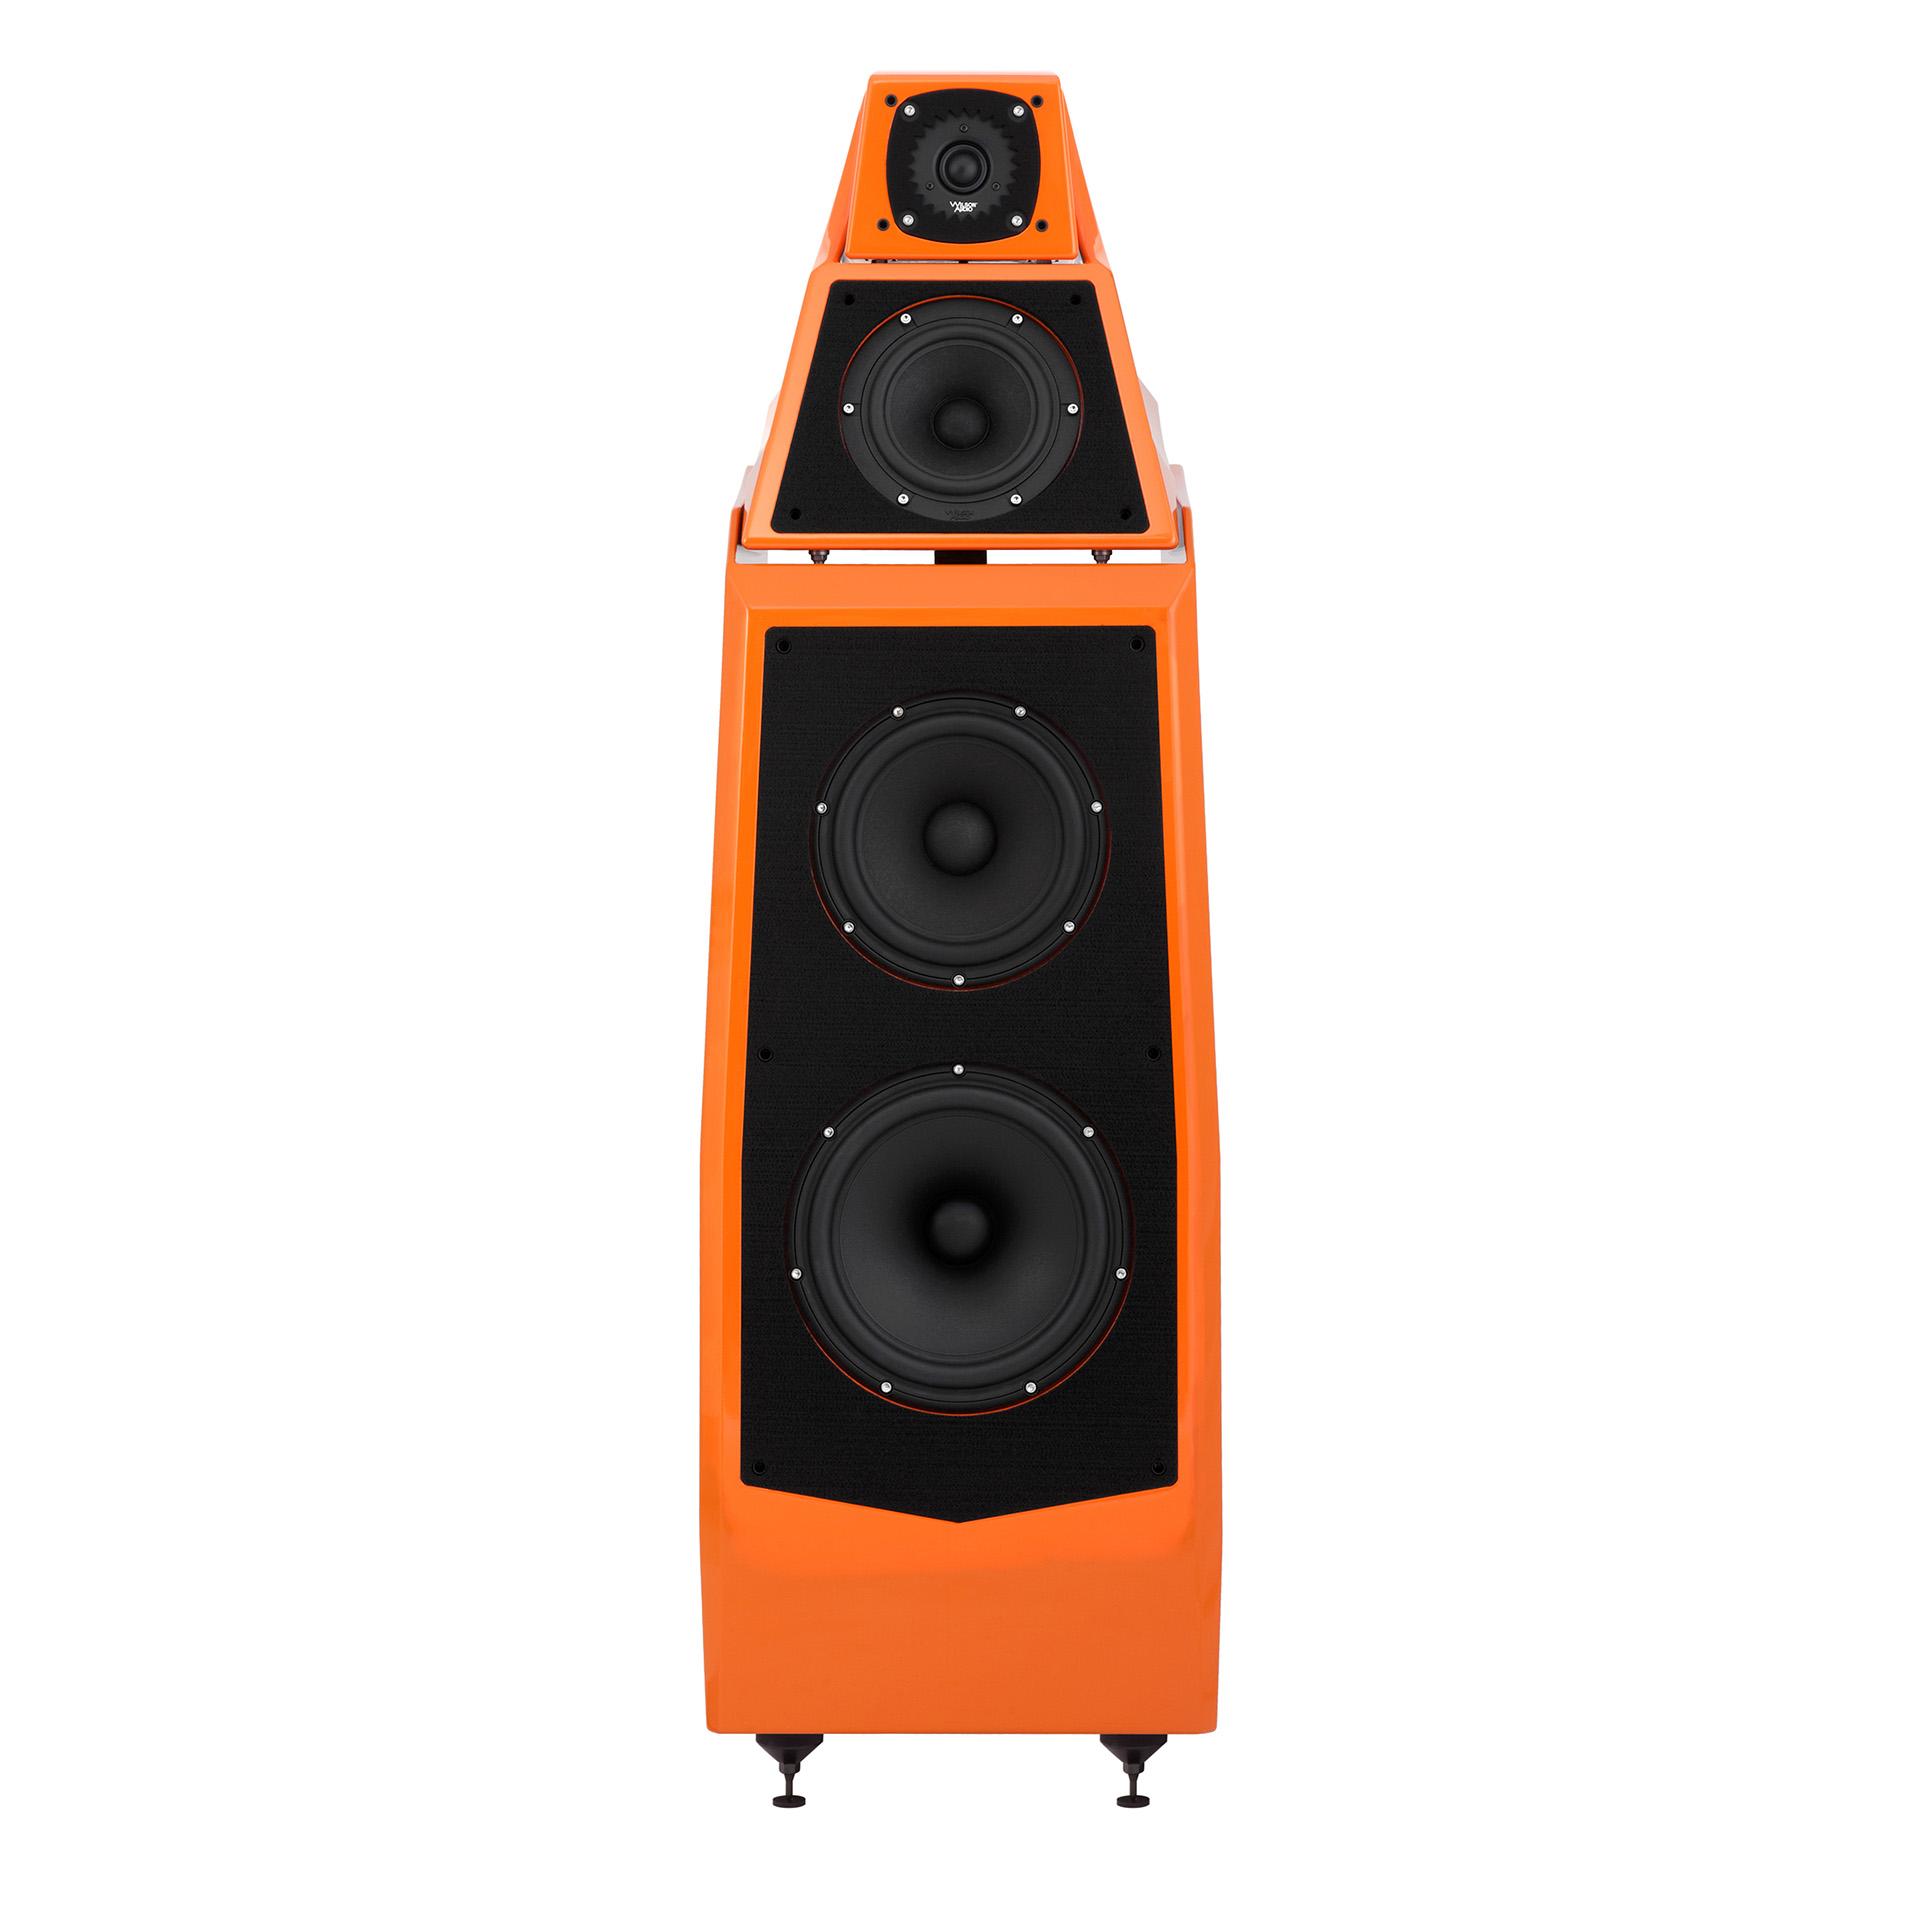 Wilson Audio Alexia - Chattelin Audio Systems